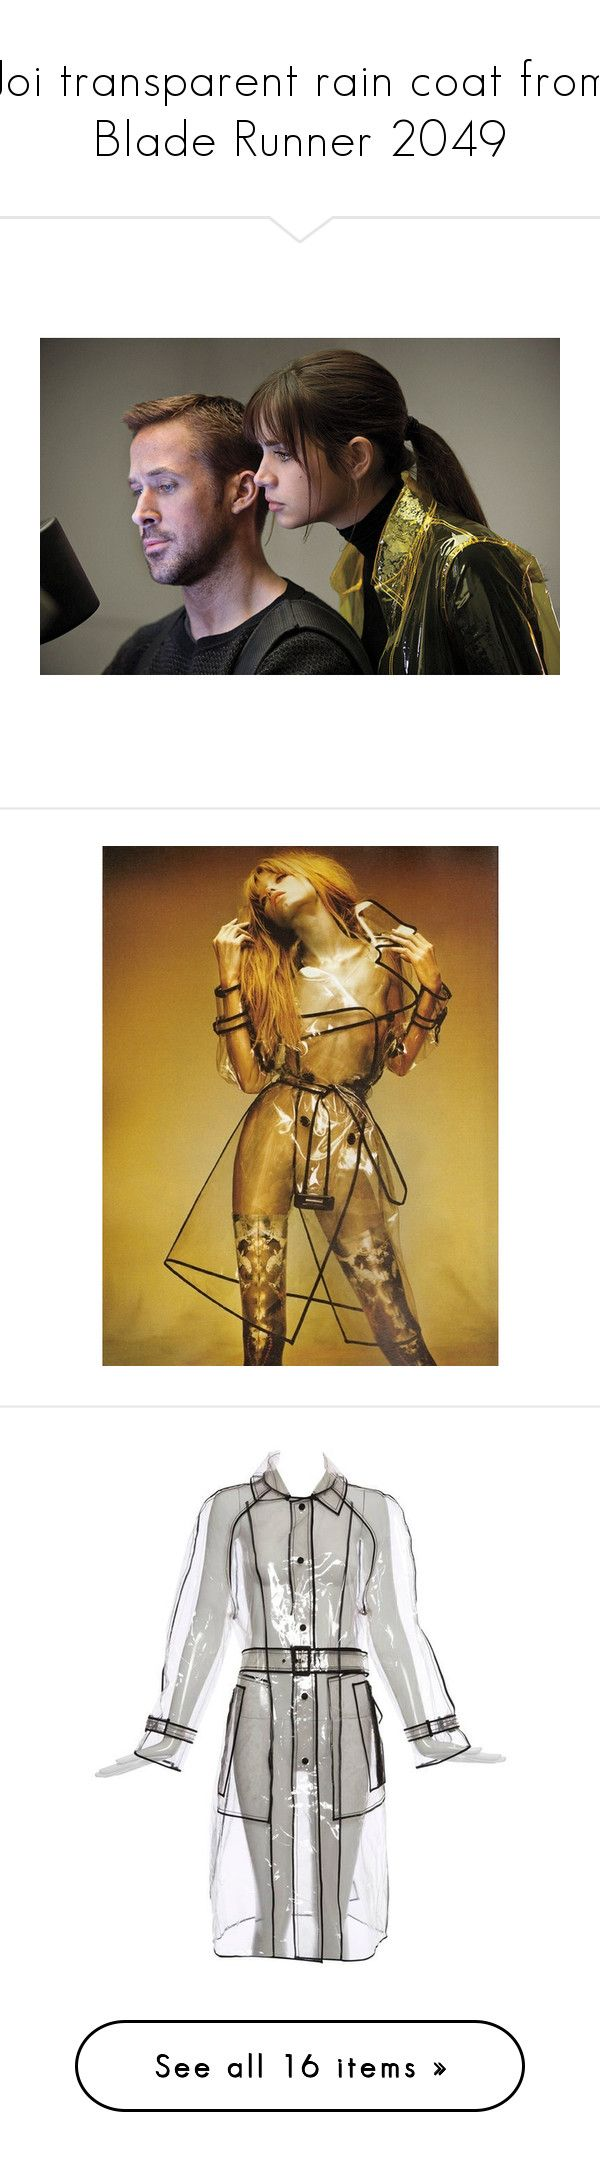 """Joi transparent rain coat from Blade Runner 2049"" by aleksa ❤ liked on Polyvore featuring outerwear, coats, grey, raincoats, prada raincoat, prada coat, pvc raincoat, grey coat, transparent rain coats and home"